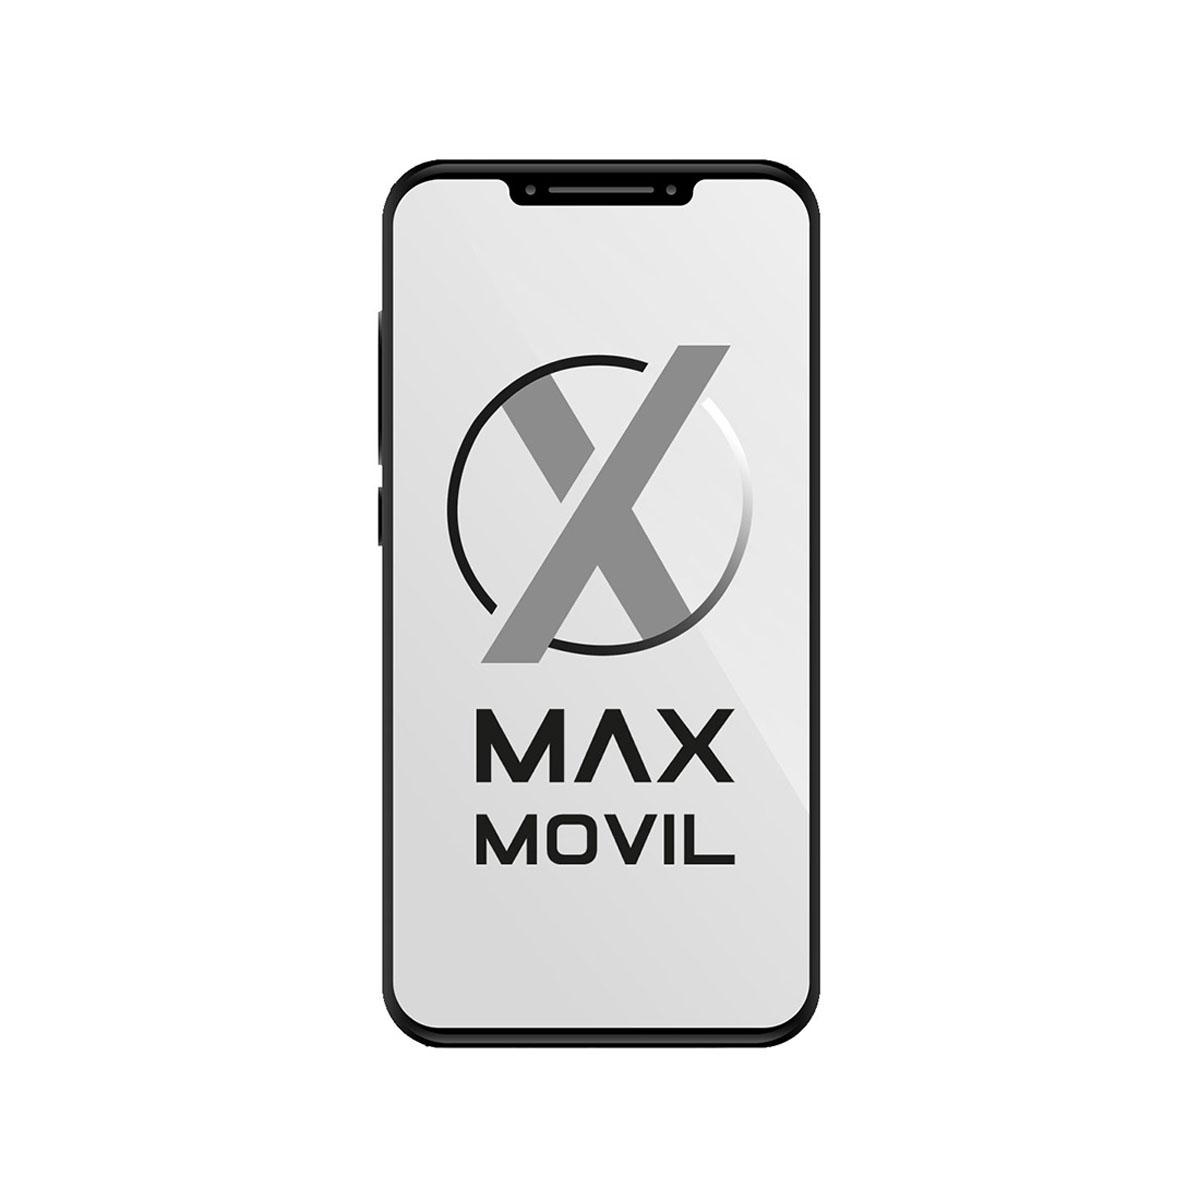 Motorola dock estandar ASMMB860DOCK para Atrix